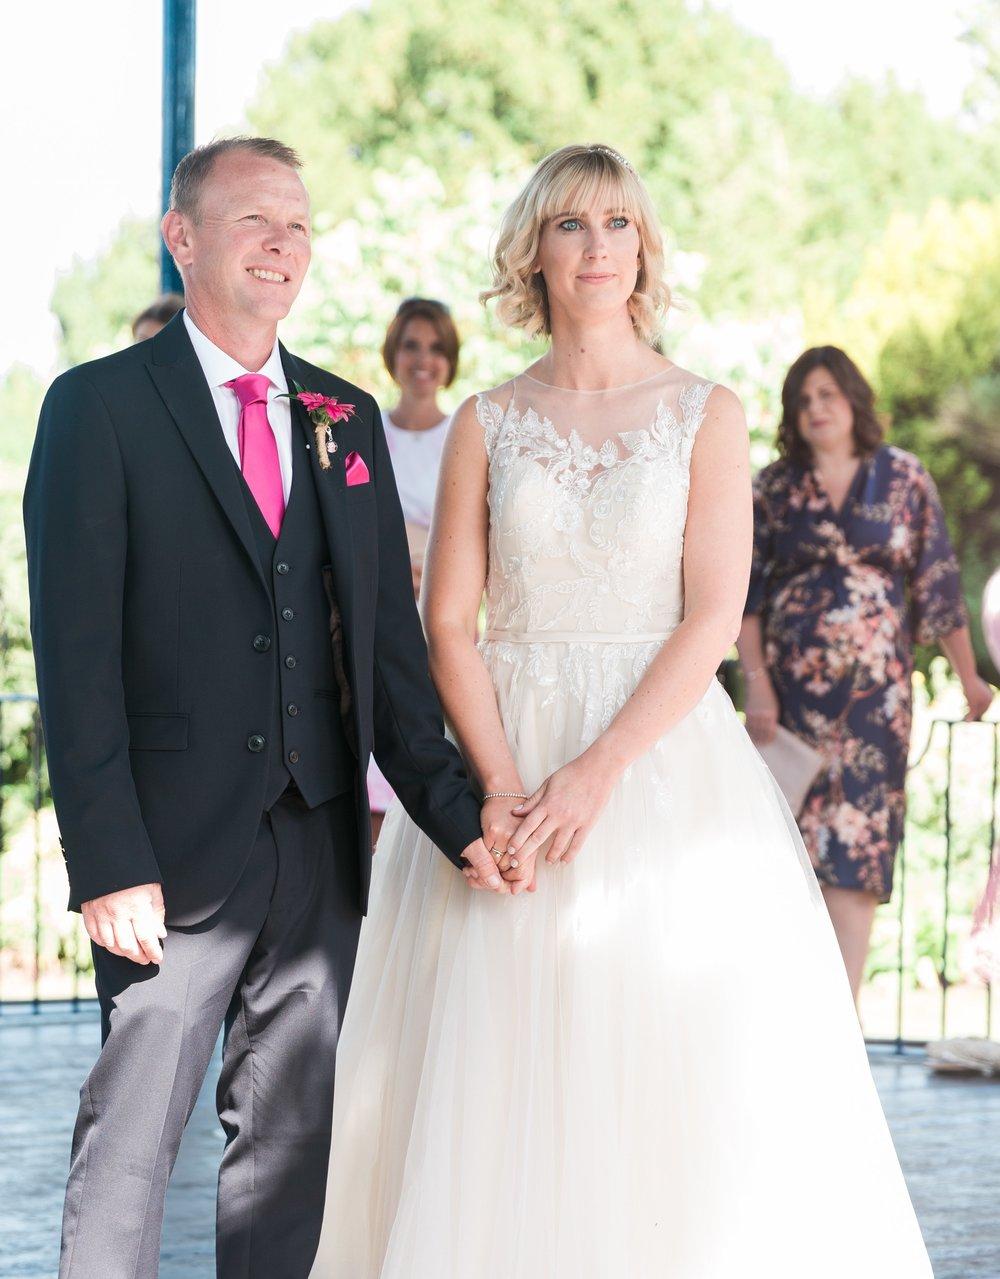 Mr&Mrs Prior-5.jpg